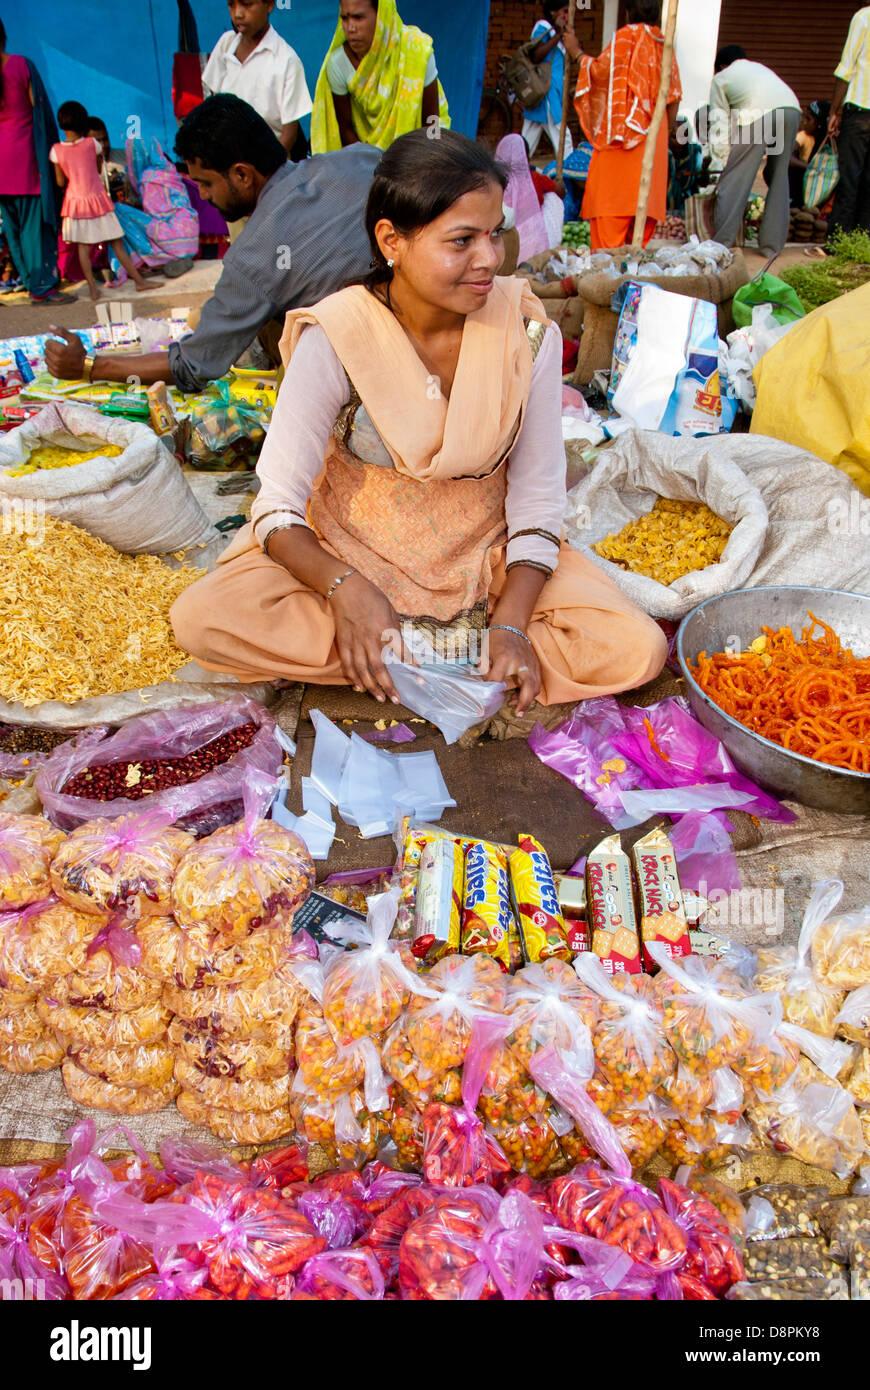 Woman street vendor in Mocha Village, Madhya Pradesh, India - Stock Image